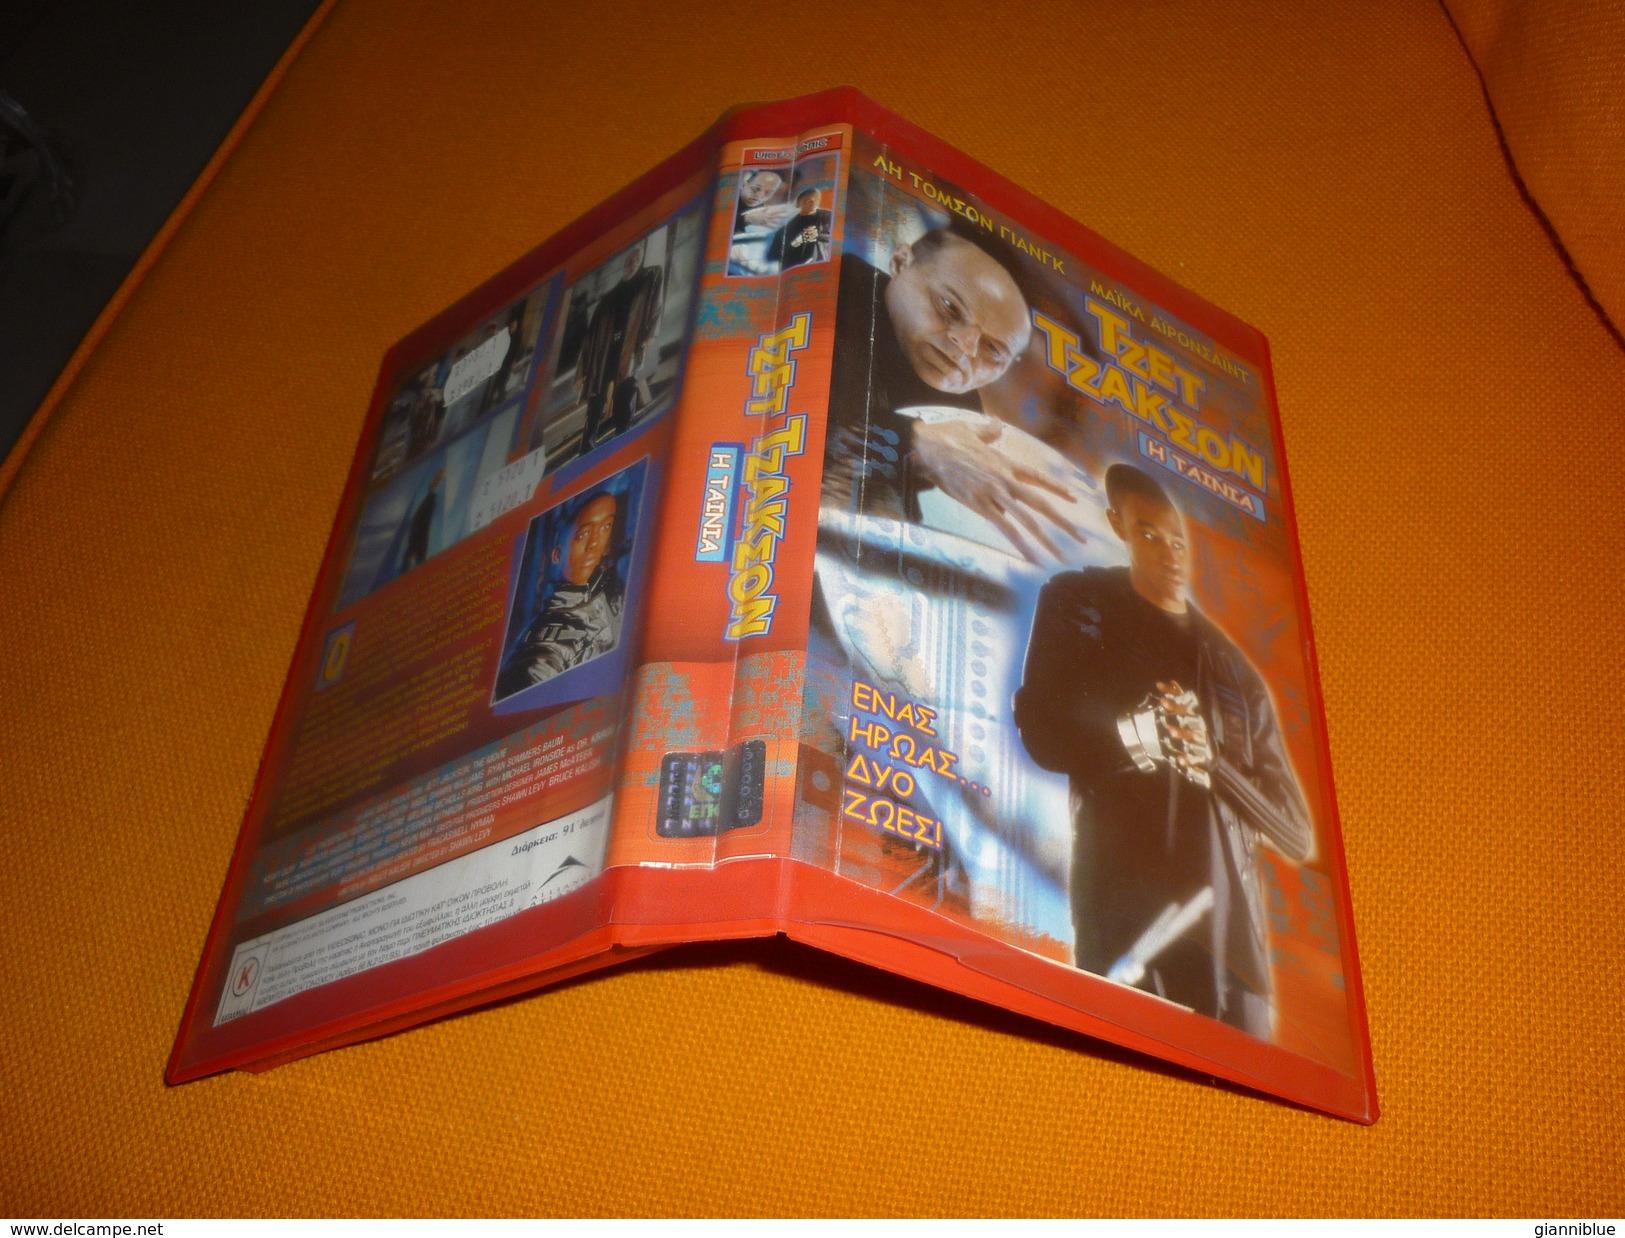 Jett Jackson: The Movie Old Greek Vhs Cassette Tape From Greece - Action, Aventure